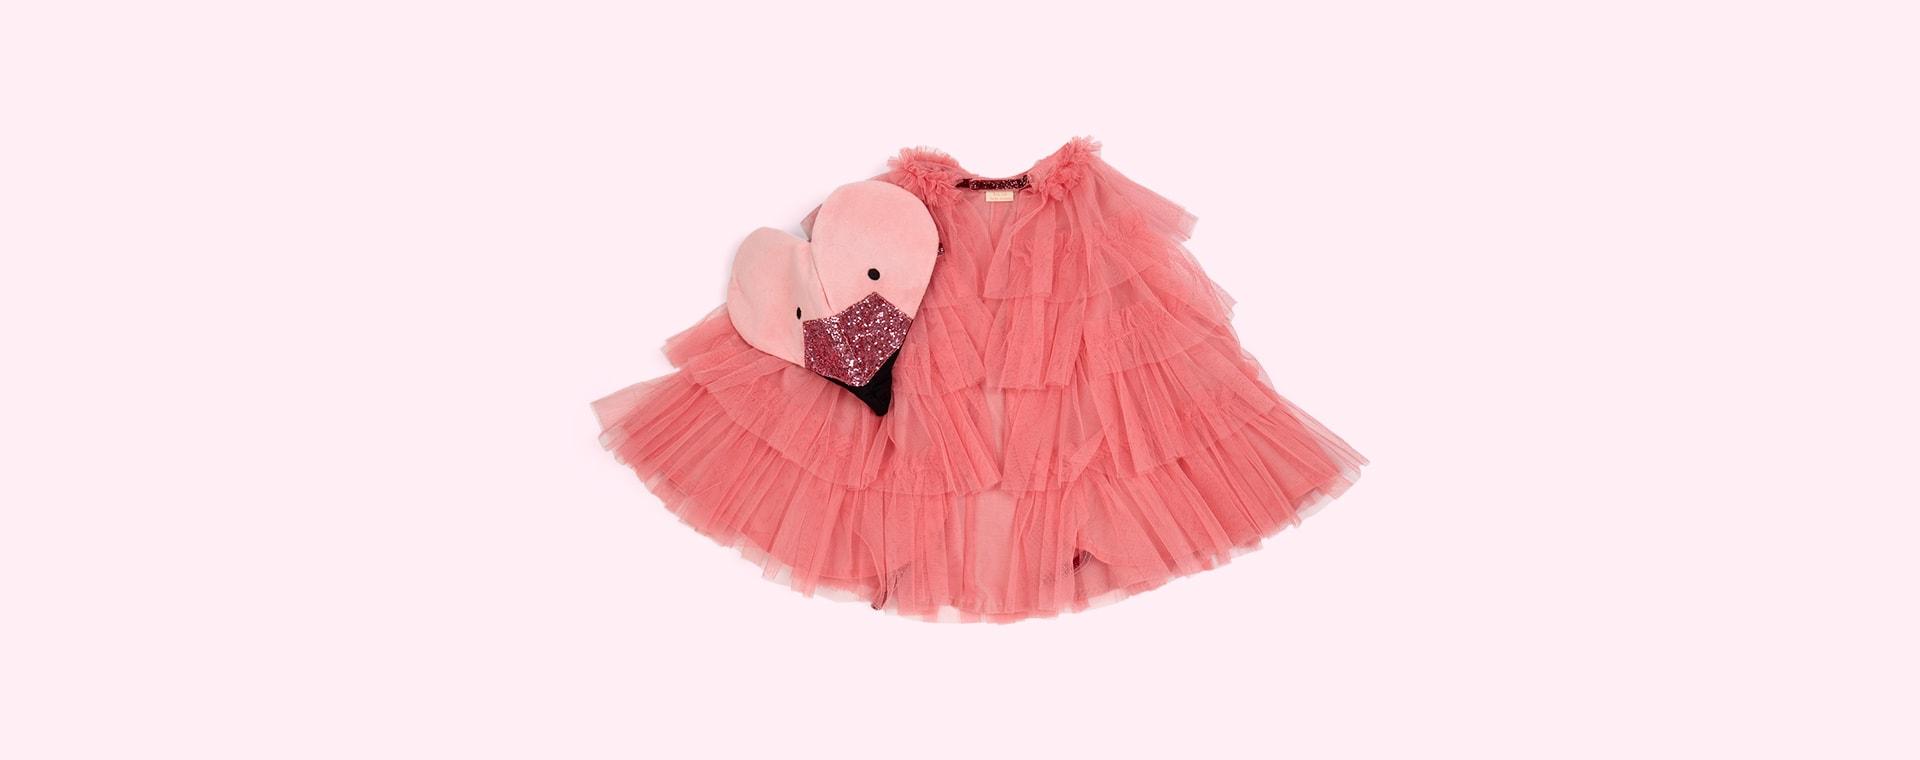 Pink Meri Meri Flamingo Cape Dress Up